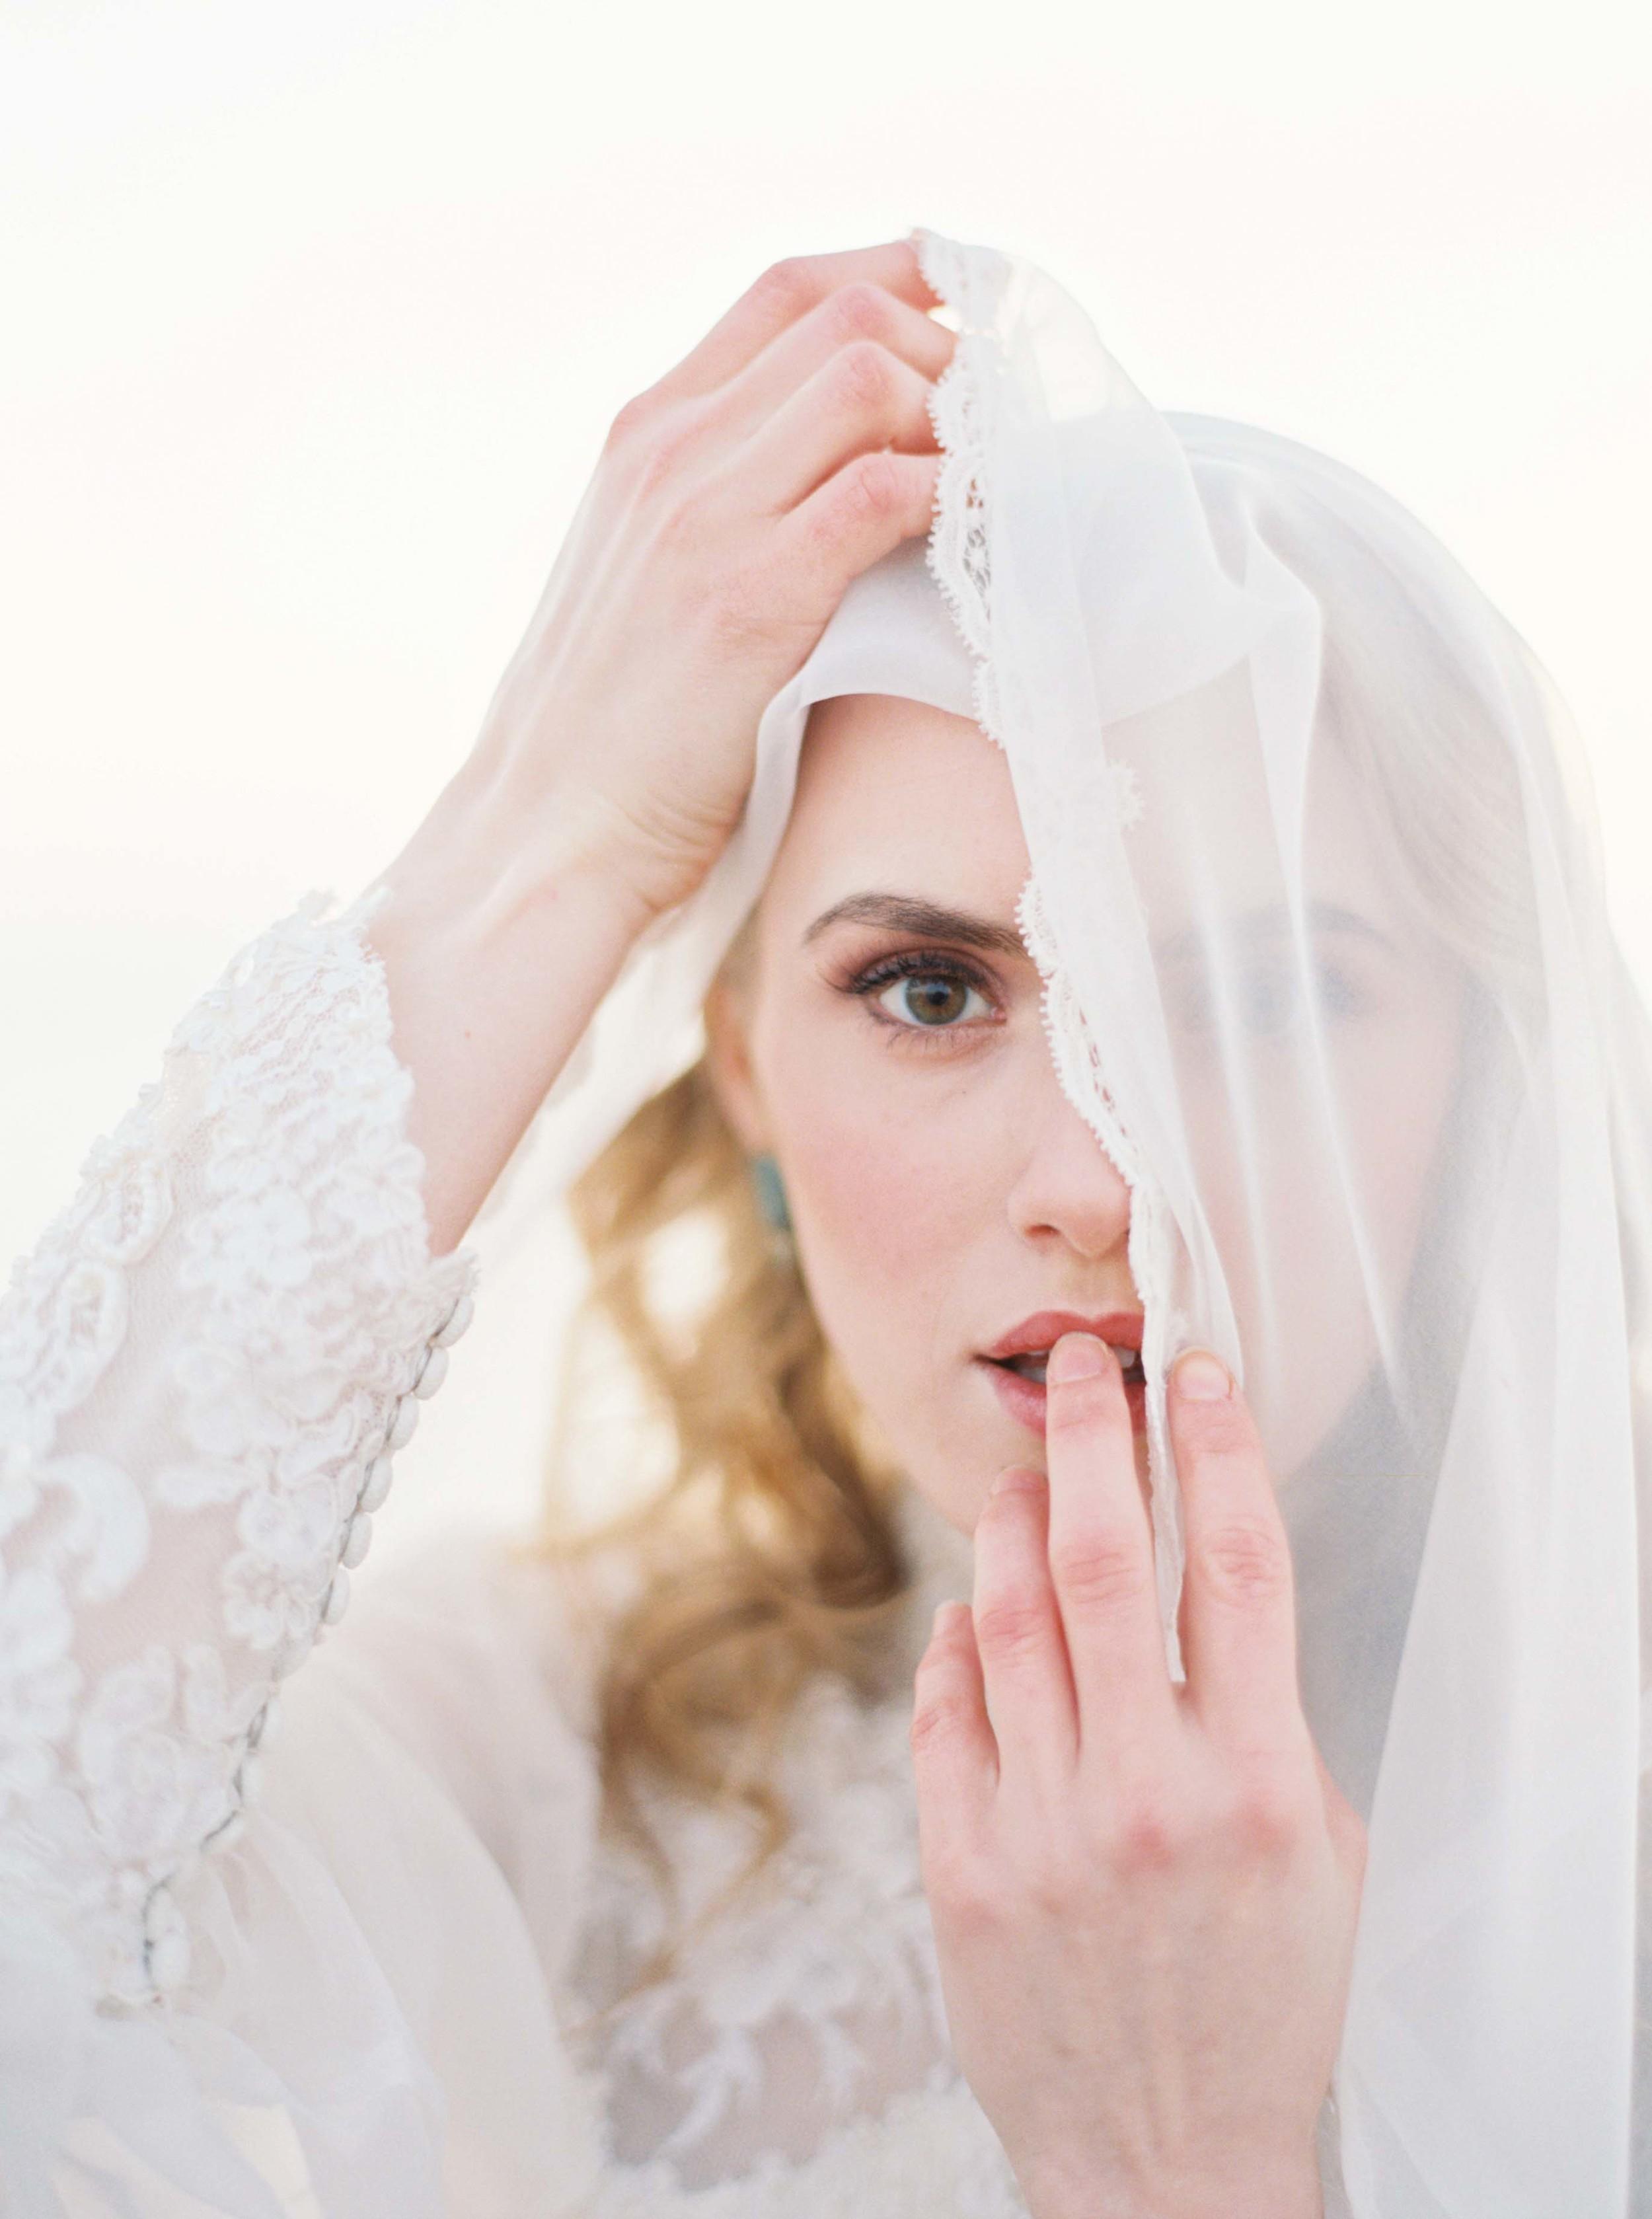 Kyle John l Fine Art Wedding Photography l Chicago, Copenhagen, California, New York, Destination l Blog l Sea and Sand_33